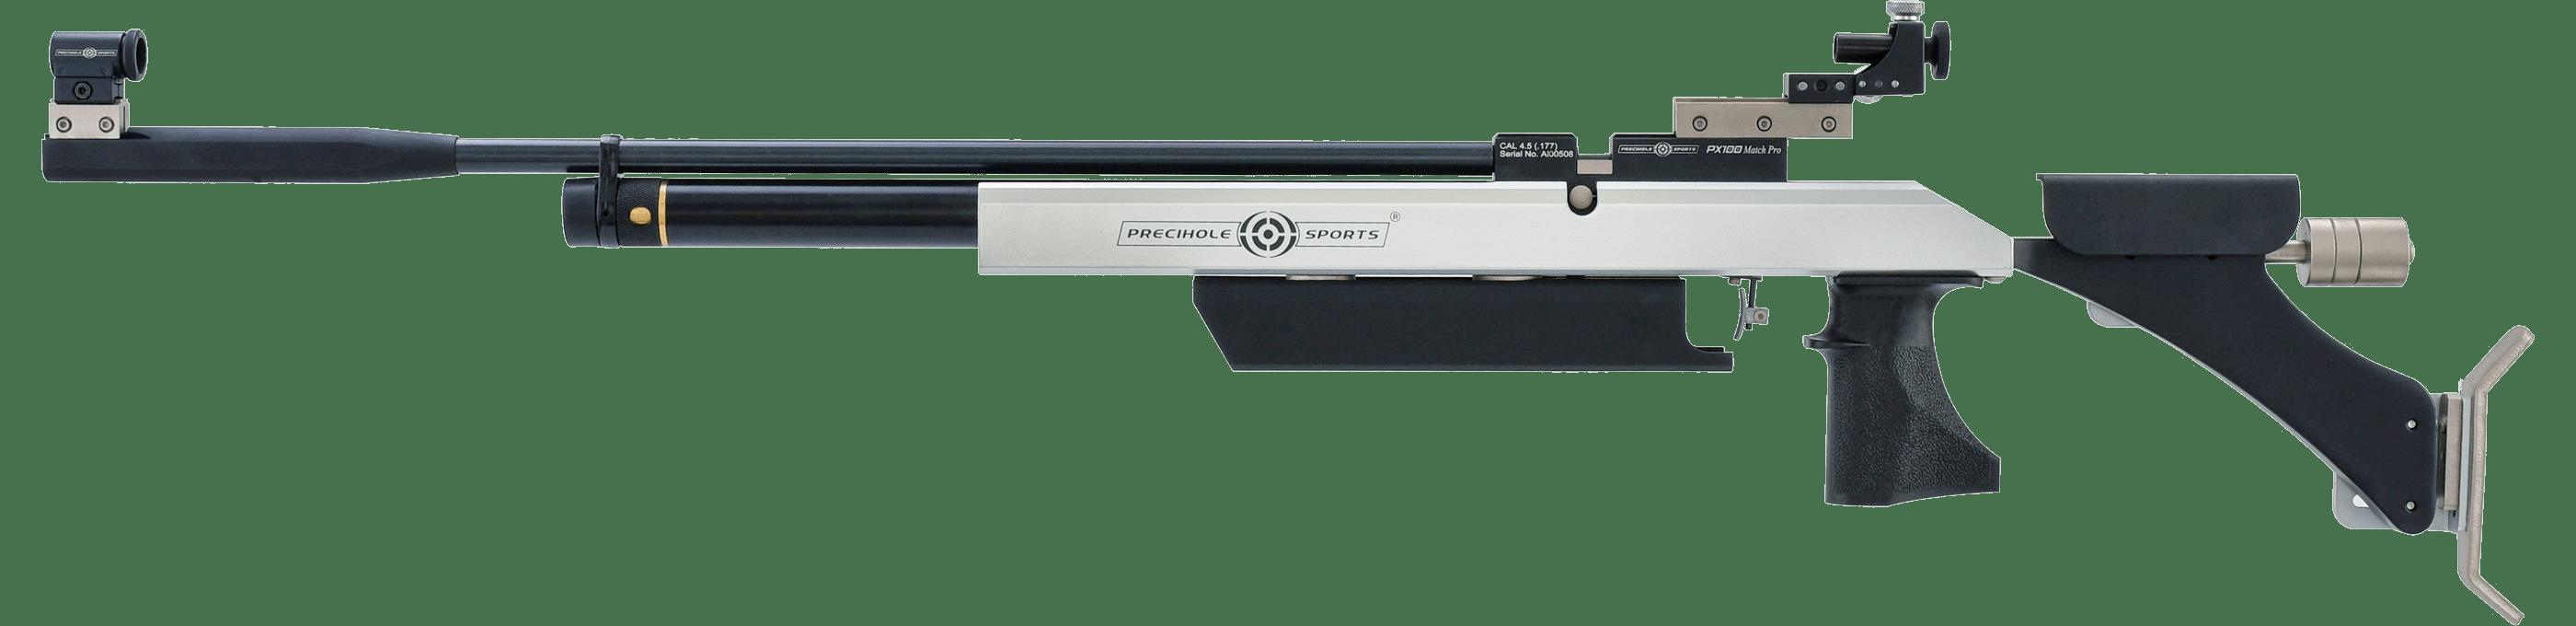 PX100-PCP-Match-Pro-Rifle